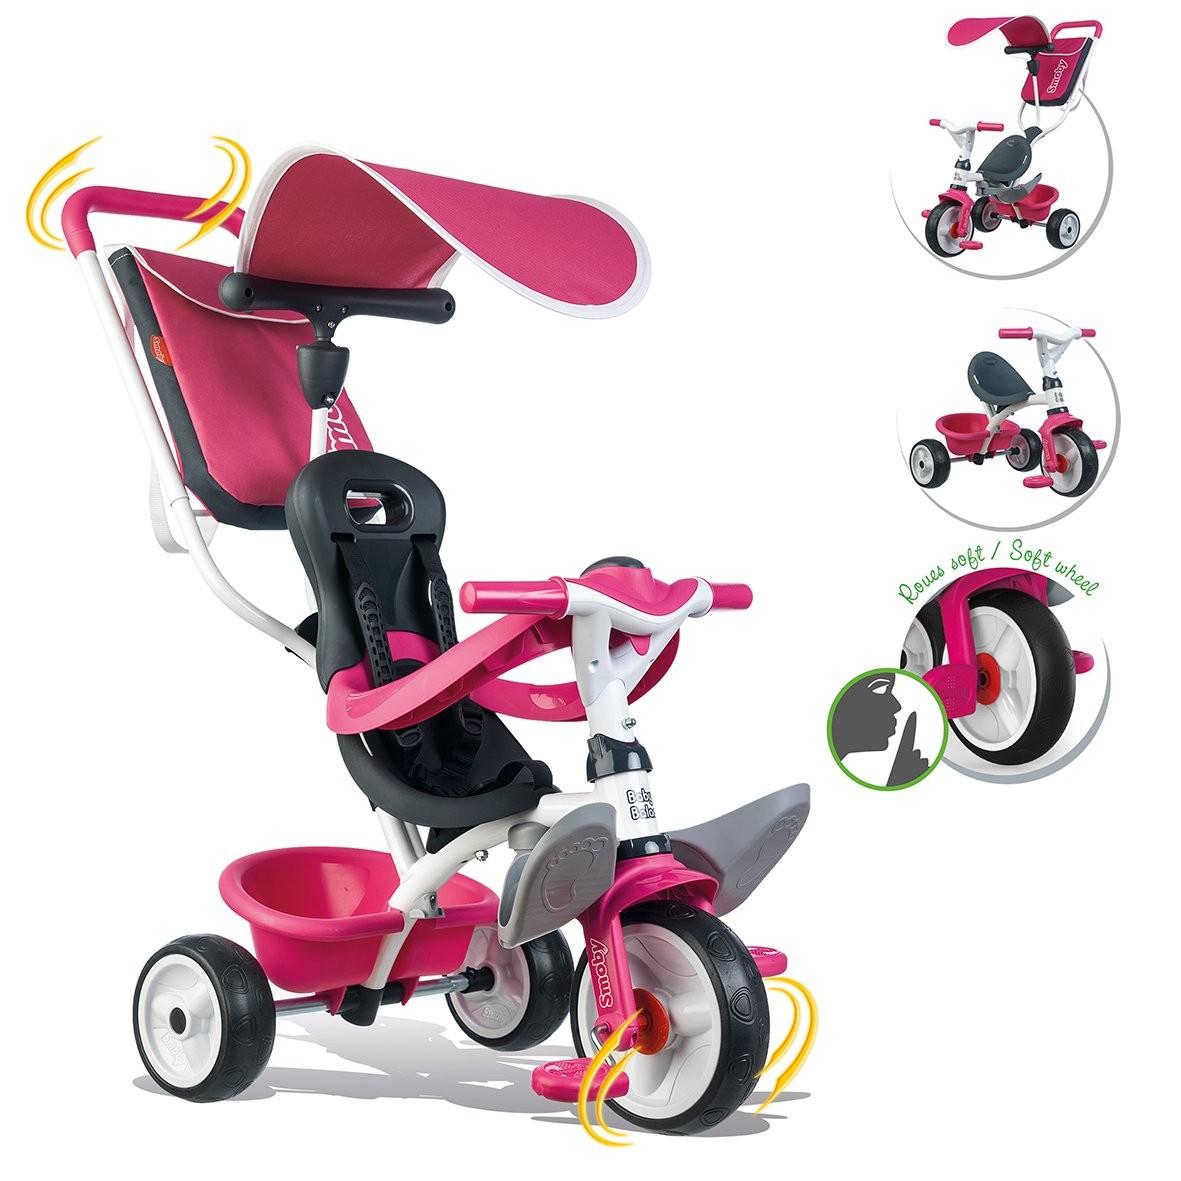 Triciclo Baby Balade Girl Smoby